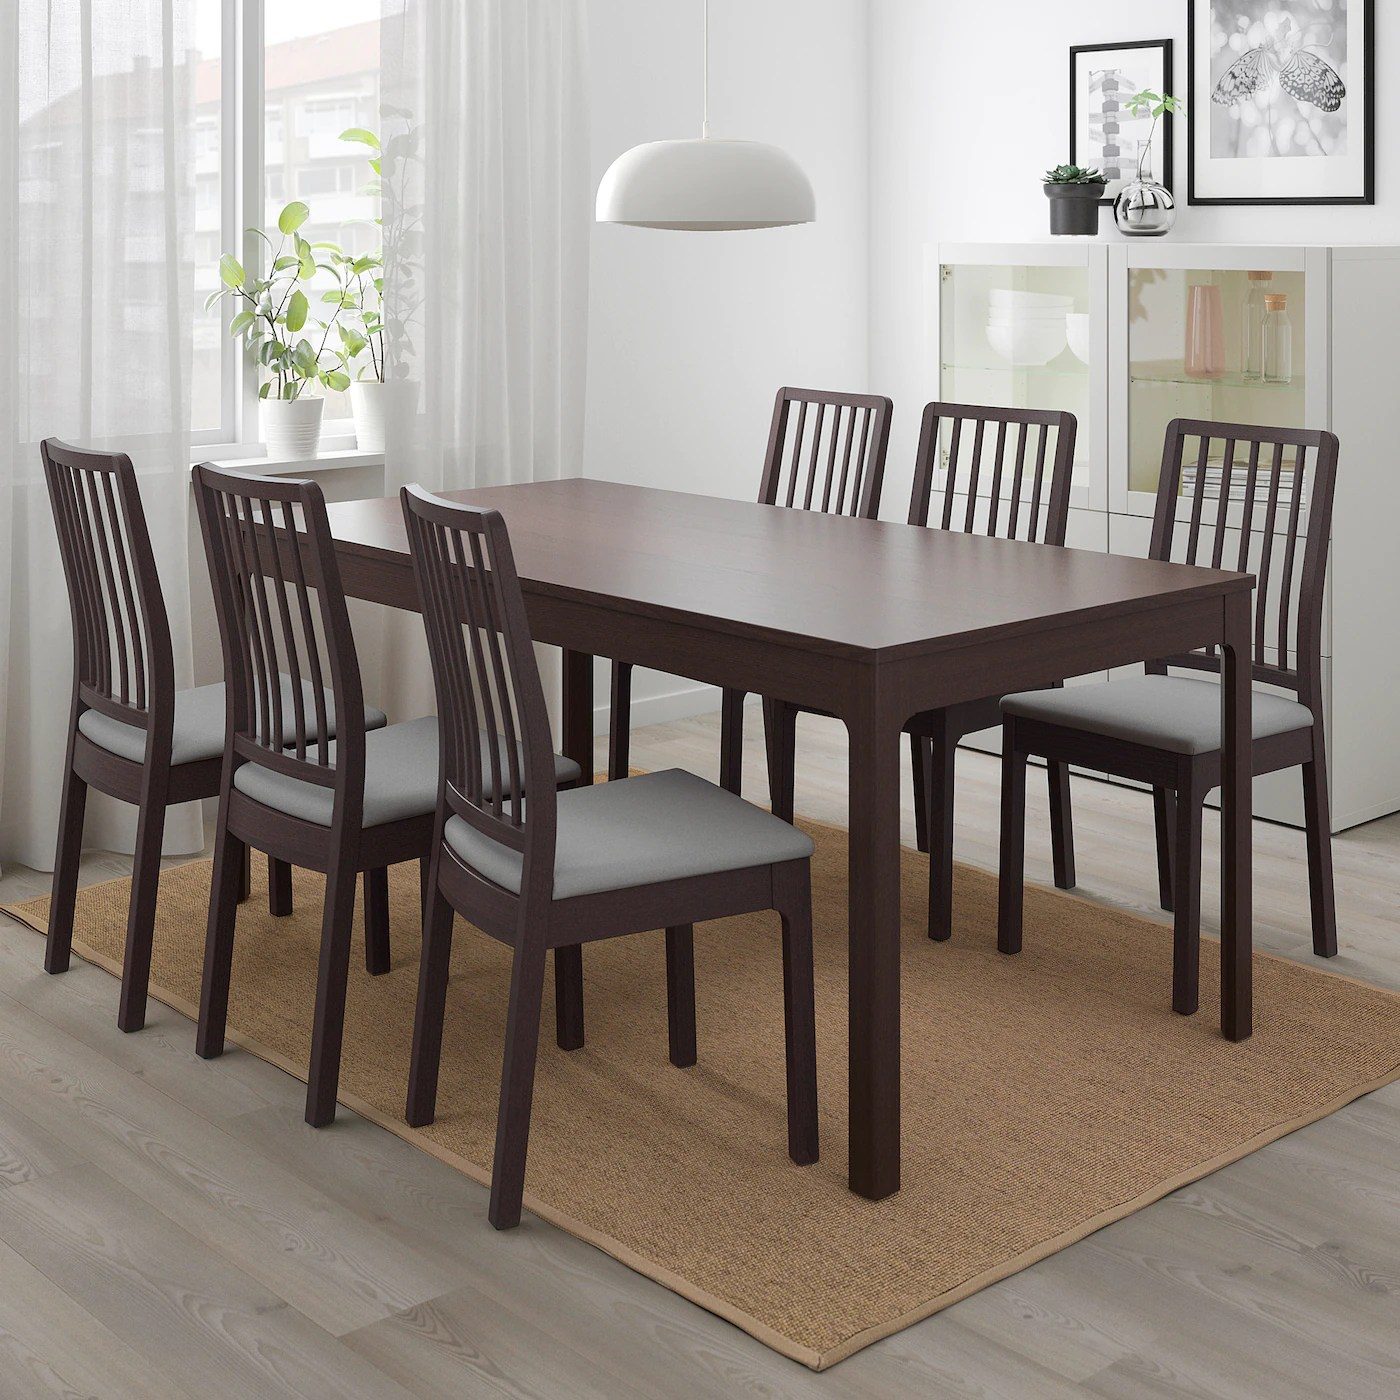 Ekedalen Table Extensible Brun Fonce 180 240x90 Cm Ikea